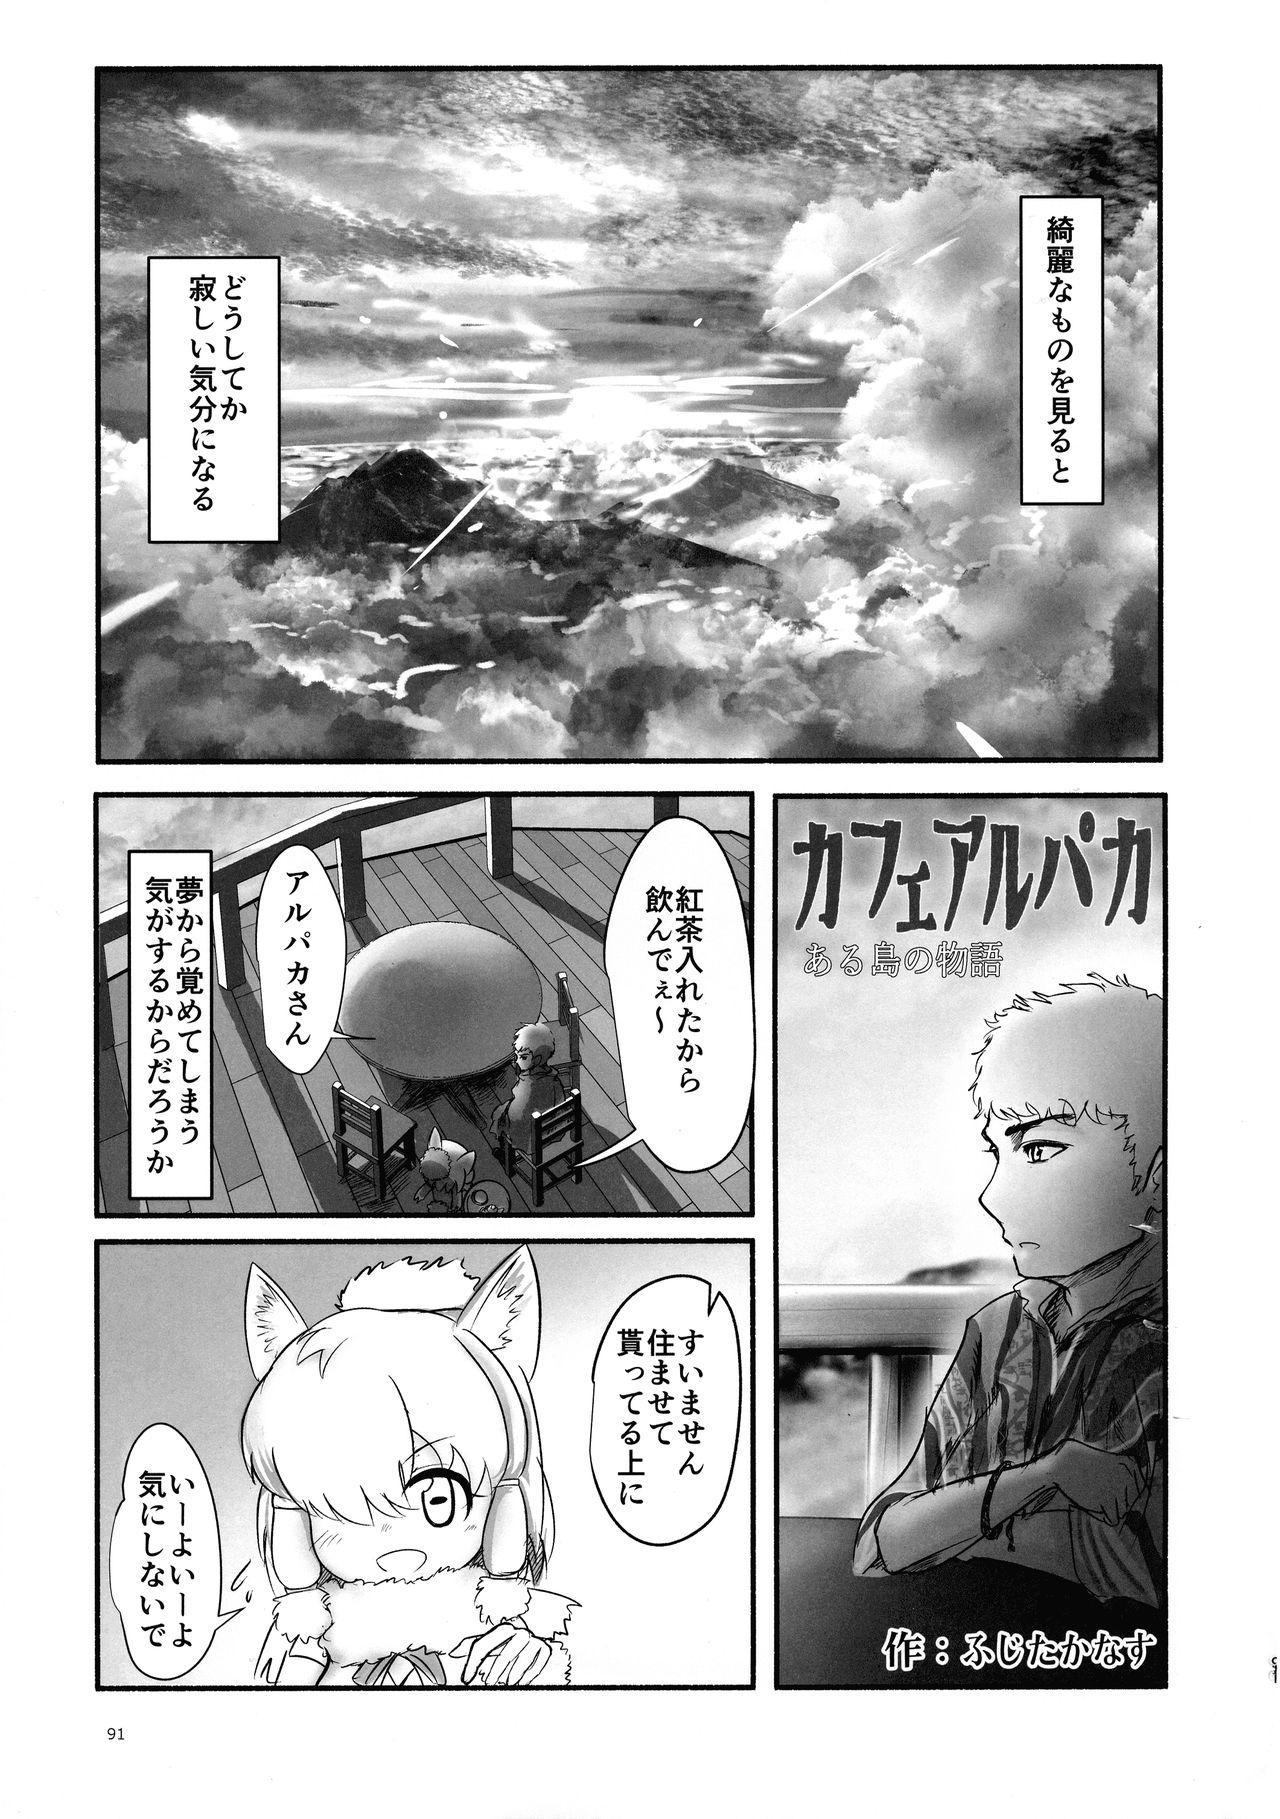 Fuwaaa! Irasshaai! Ura Iyashi no Alpaca-san Goudou 90